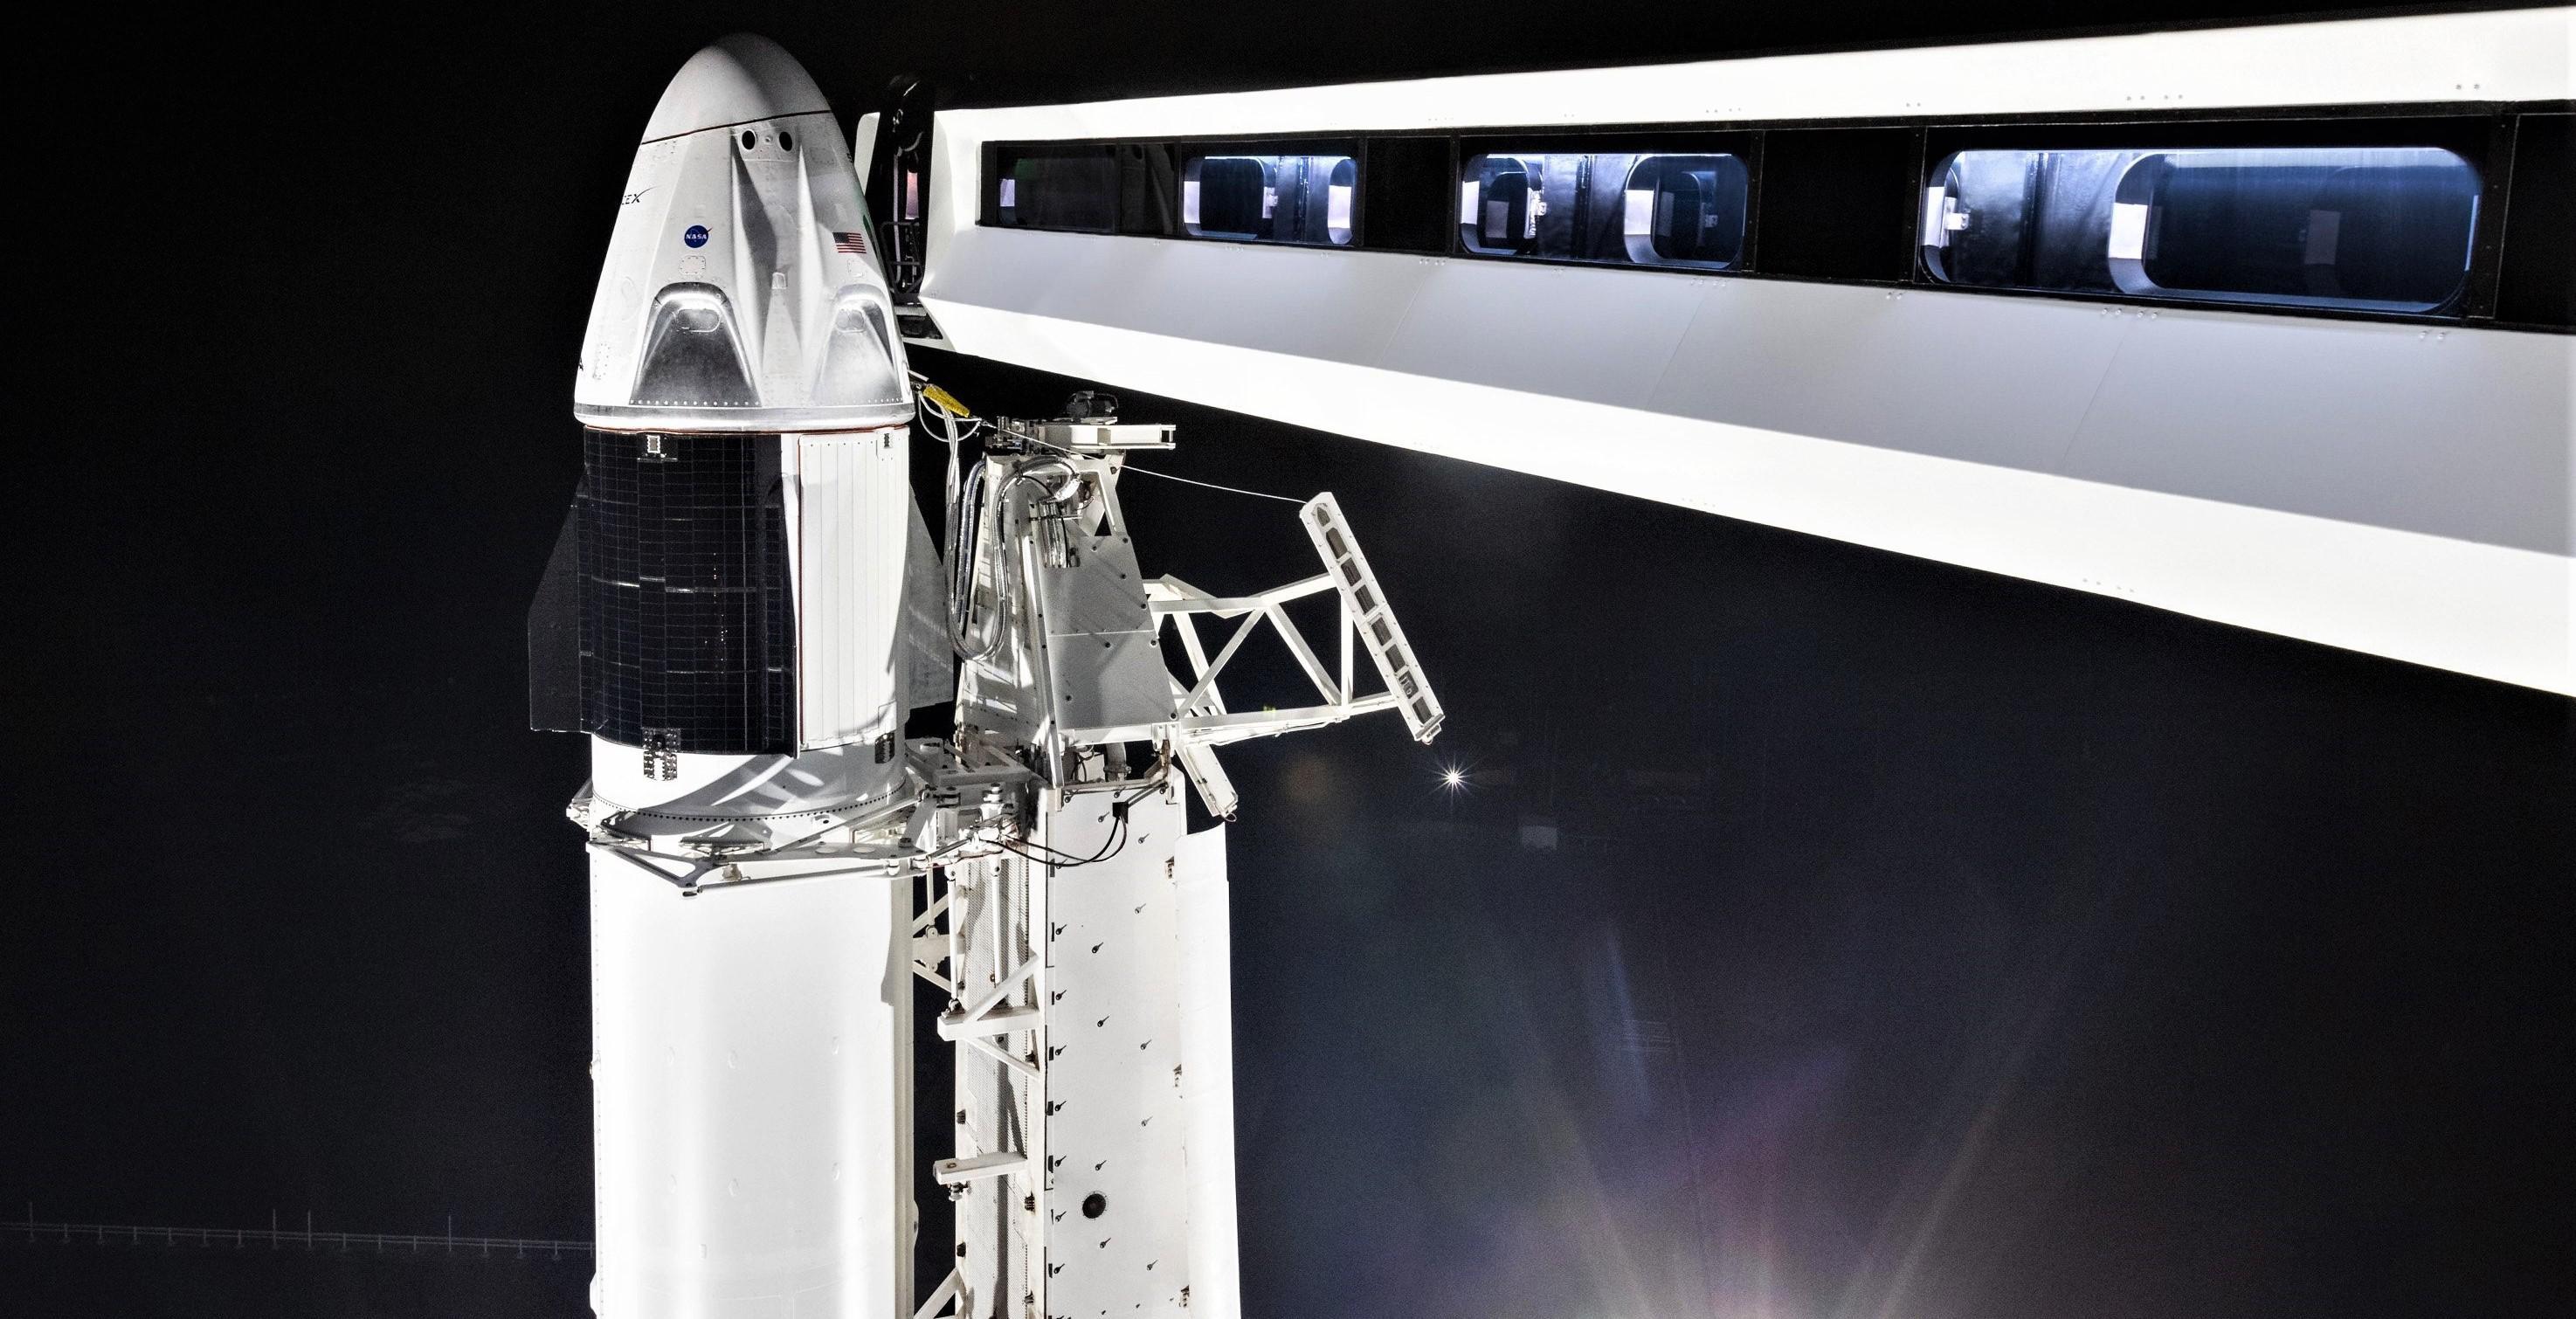 Crew Dragon DM-1 Falcon 9 B1051 rollout (SpaceX) 4 wide